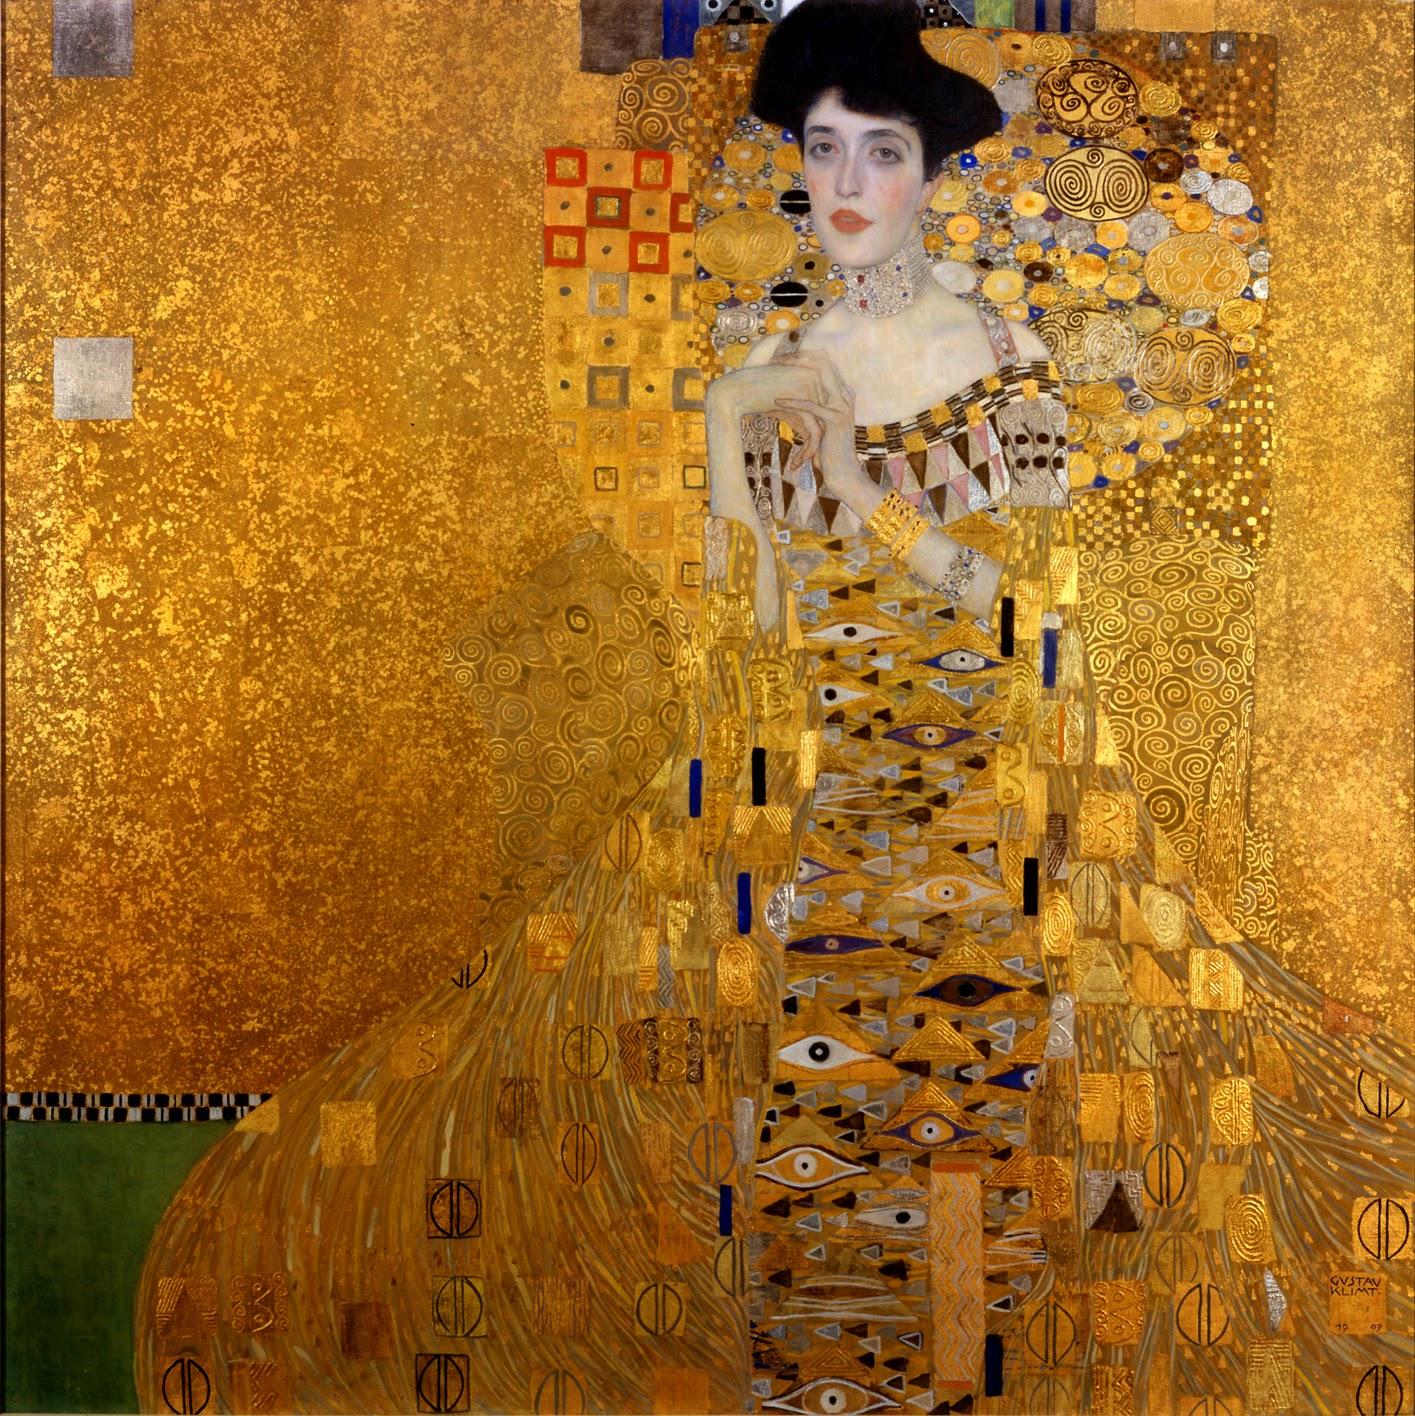 oeuvre de Gustav_Klimt